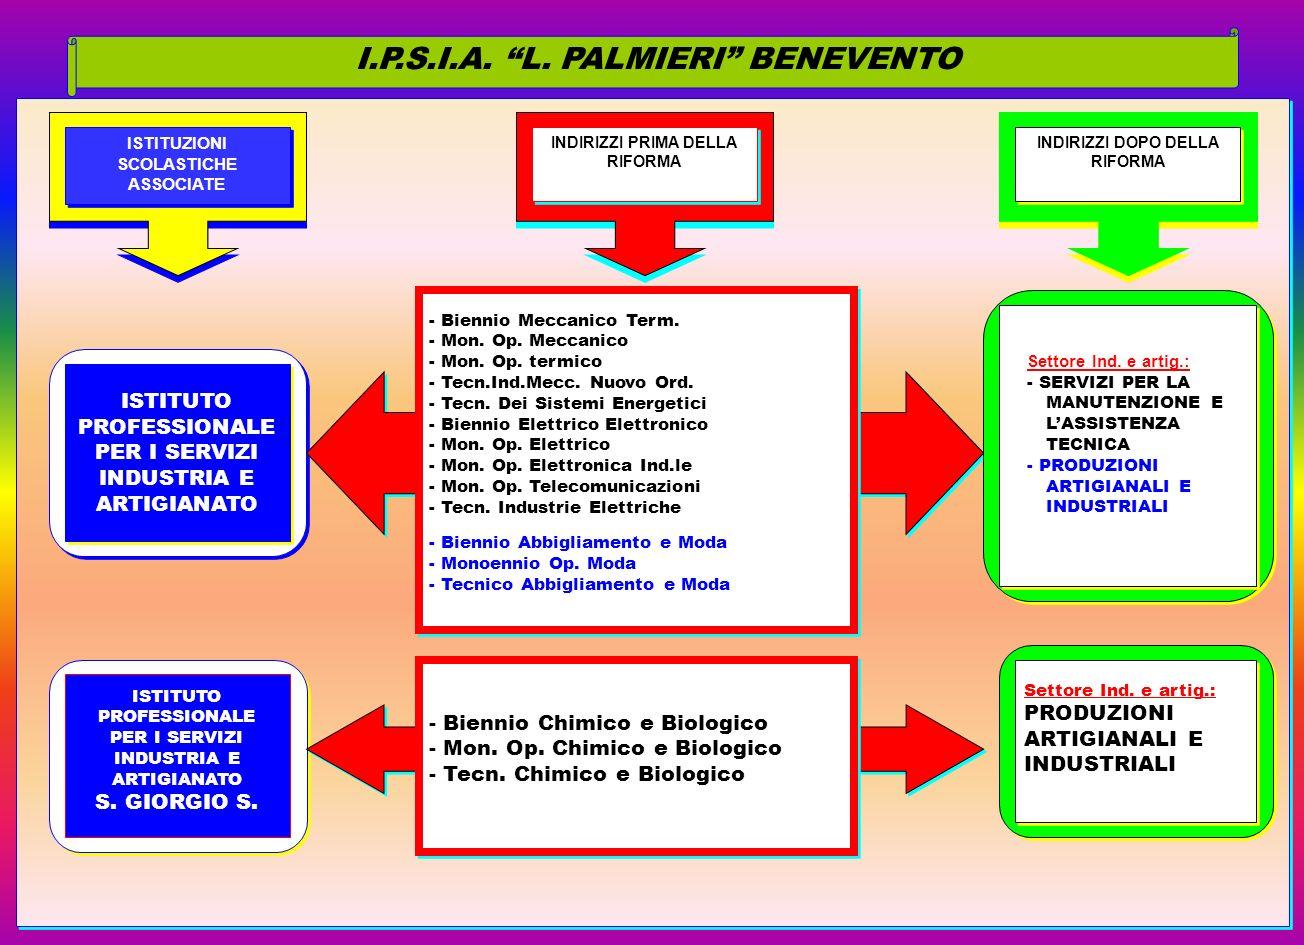 I.P.S.I.A. L. PALMIERI BENEVENTO